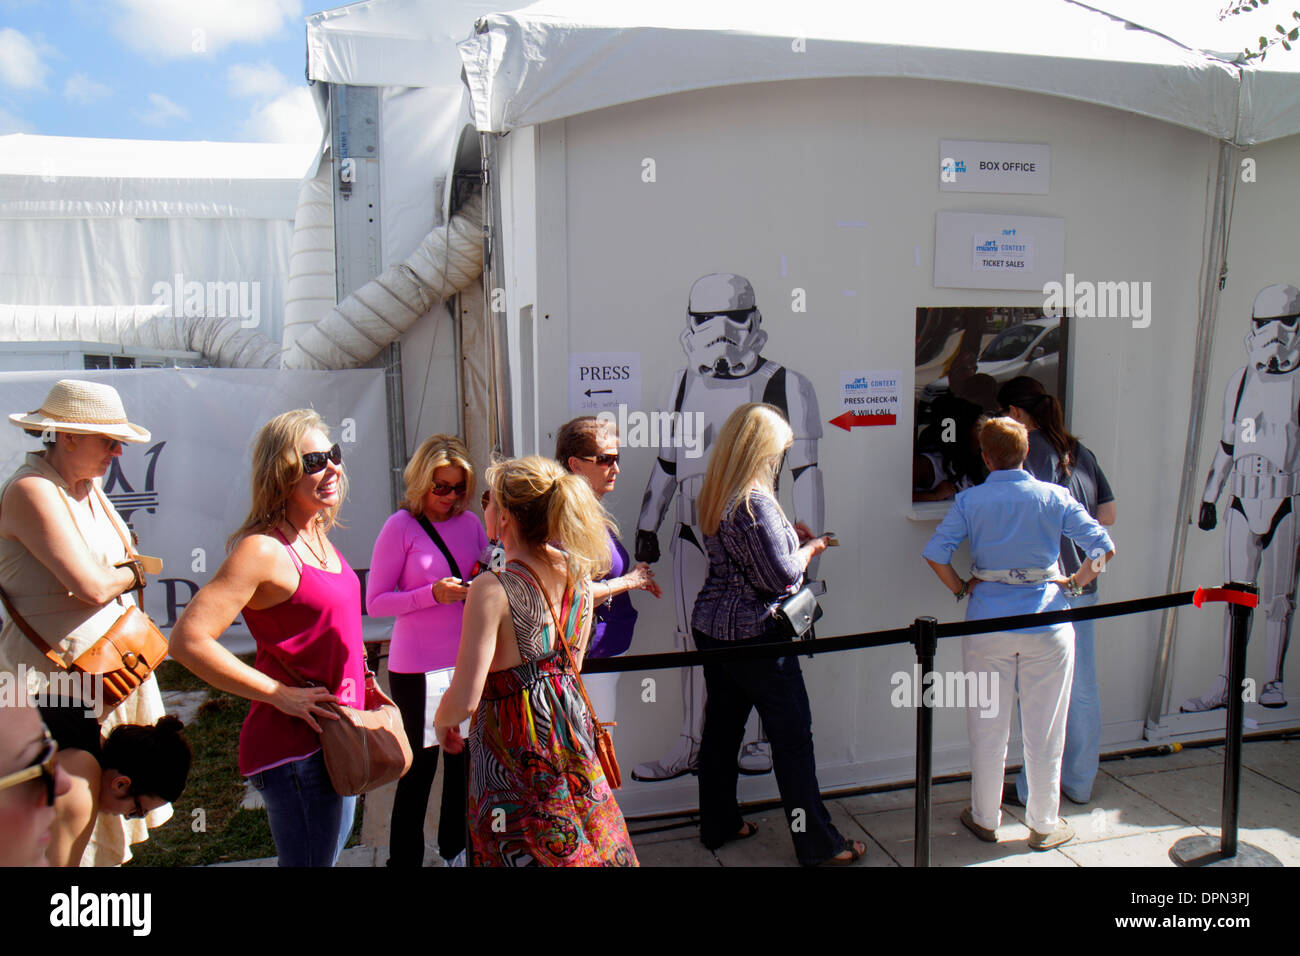 Niedlich Rahmen Art Miami Bilder - Benutzerdefinierte Bilderrahmen ...